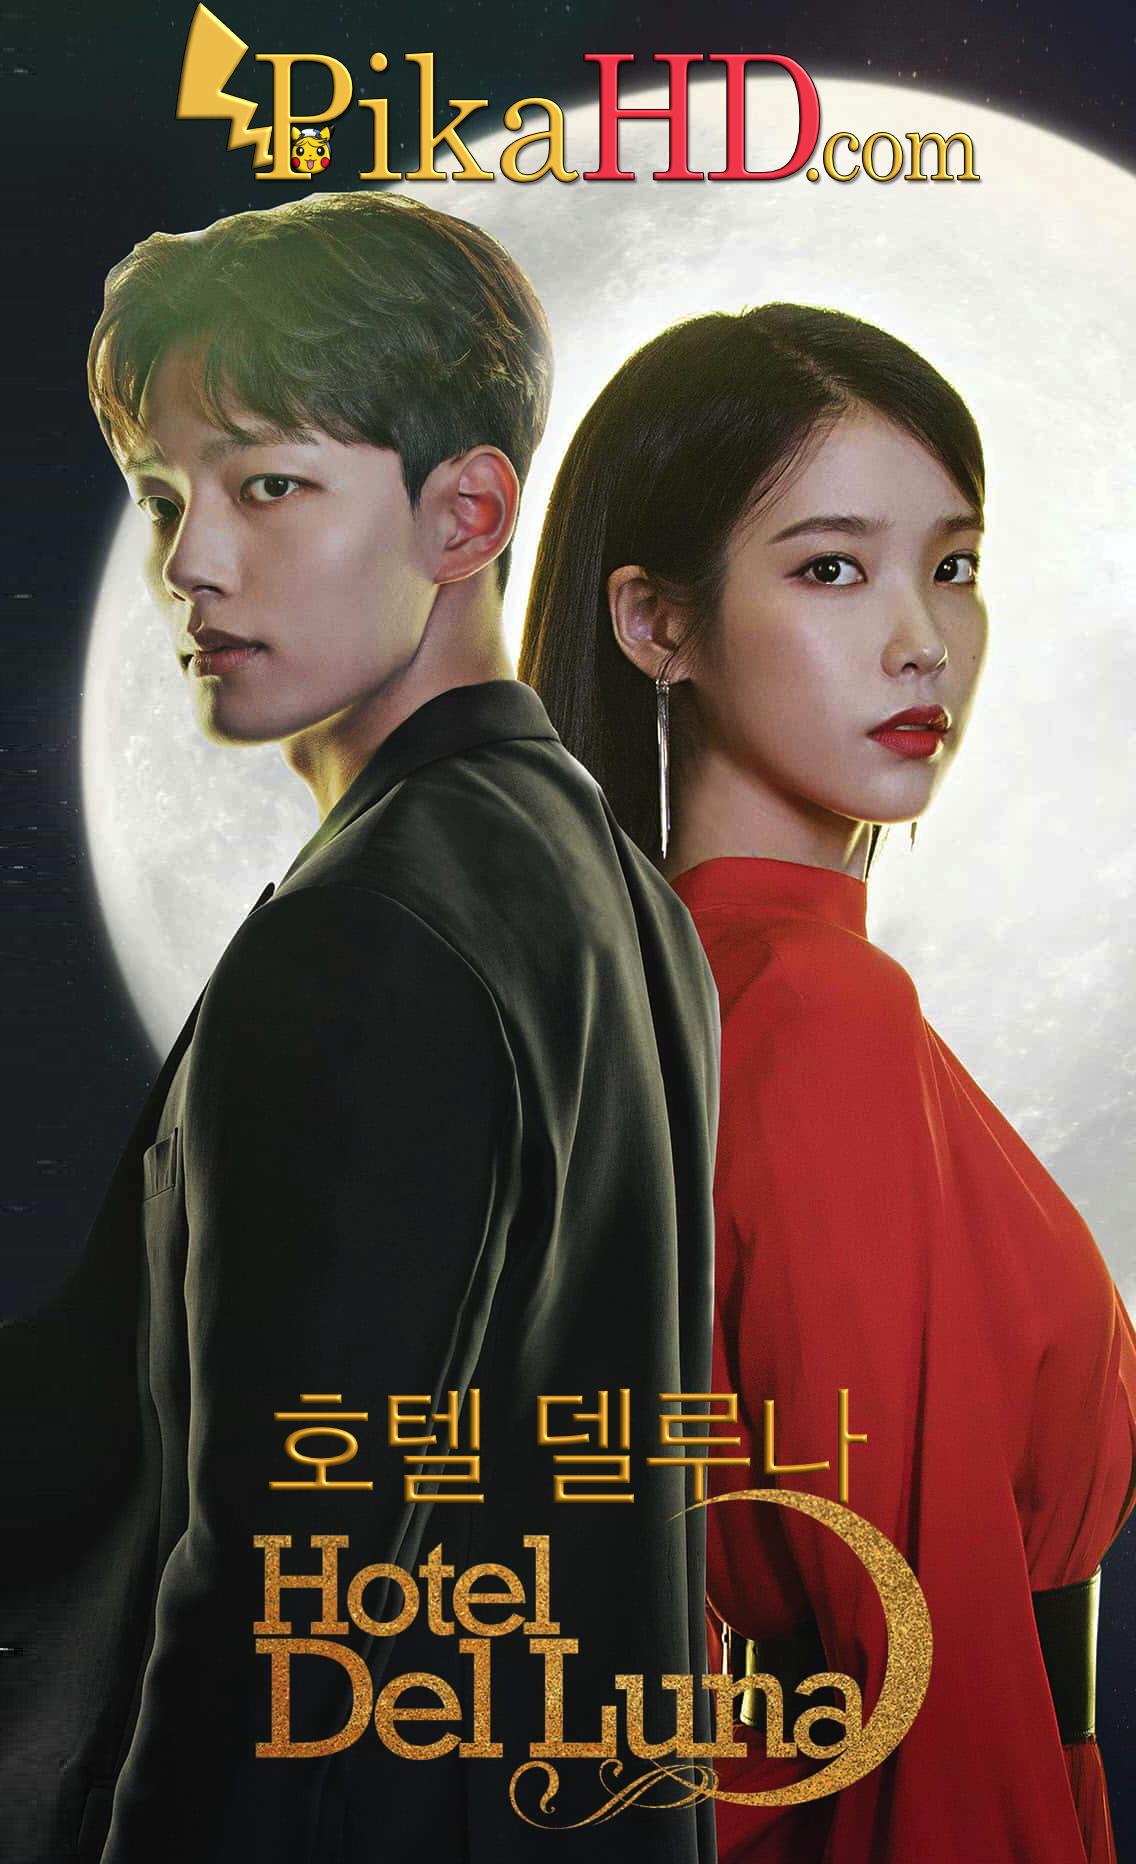 Download Drama Korea Hotel Del Luna Subtitle Indonesia : download, drama, korea, hotel, subtitle, indonesia, Hotel, (호텔, 델루나), Episodes, Korean, Drama, Download, PikaHD, Drama,, Japanese